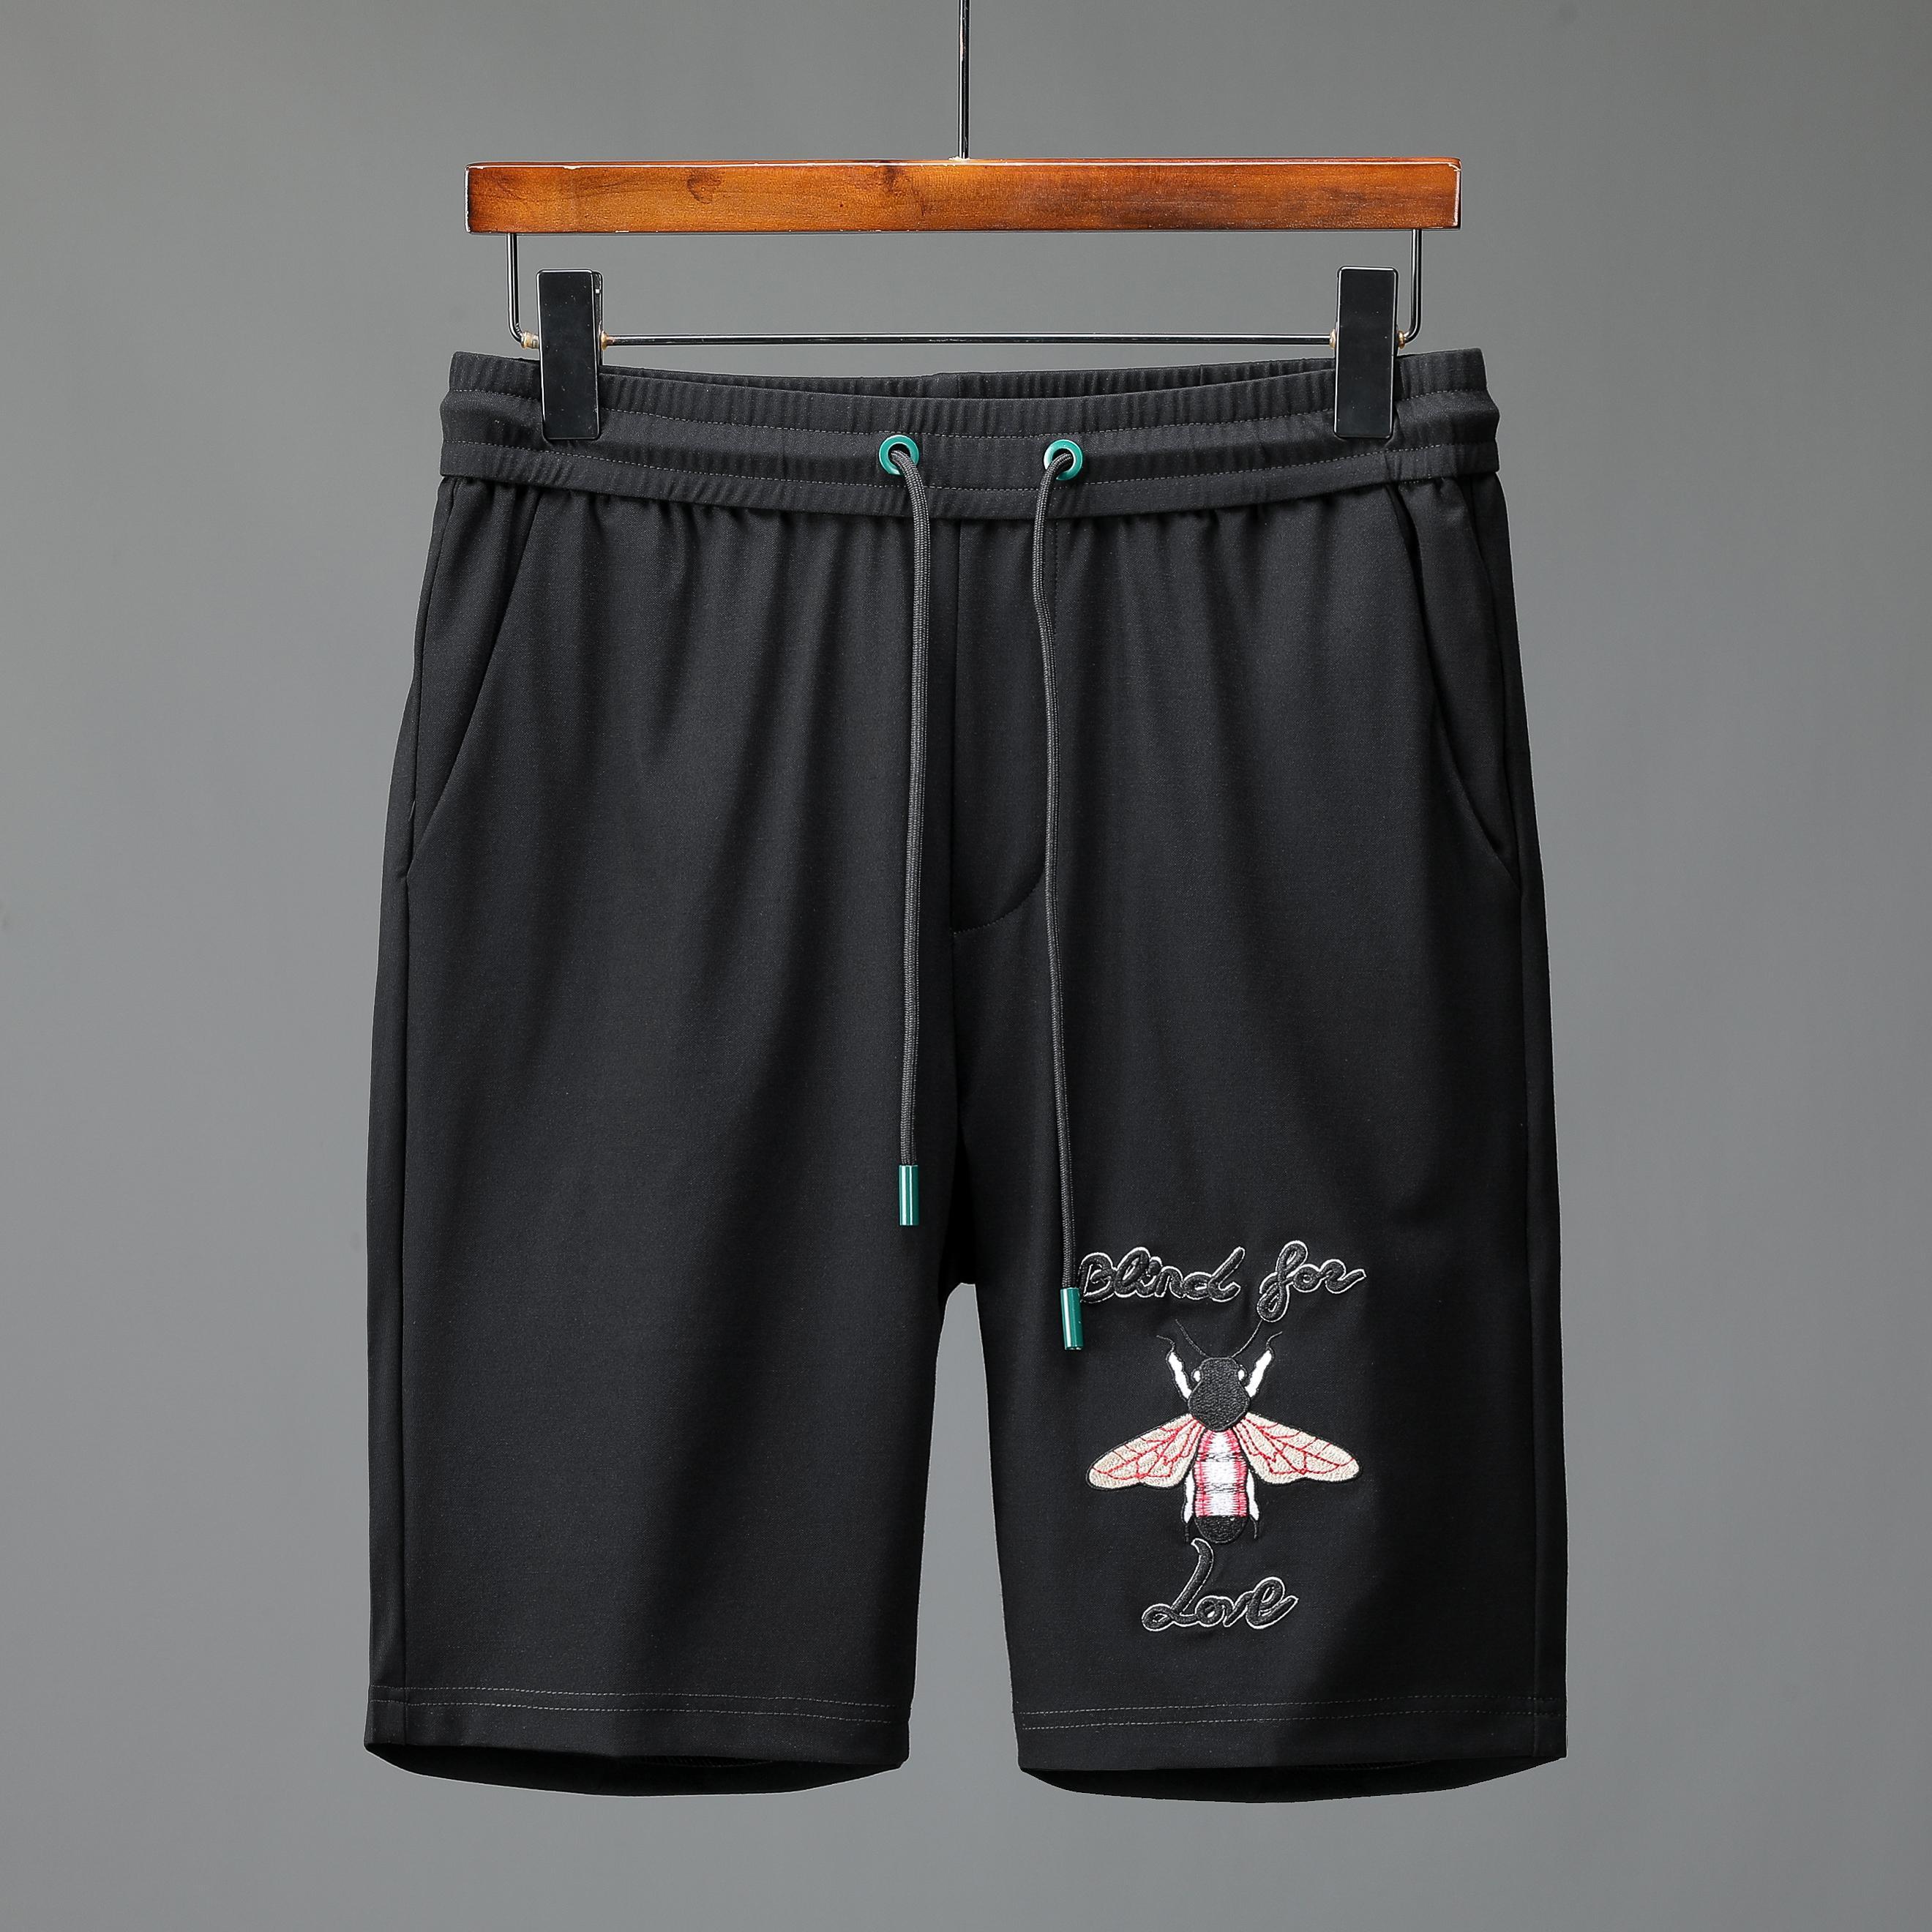 2020 D2hot Fashion Designer Waterproof Fabric Wholesale Summer Mens Shorts Brand Clothing Swimwear Nylon Beach Pants Swimming Board Shorts Sport From Qq9933 24 37 Dhgate Com